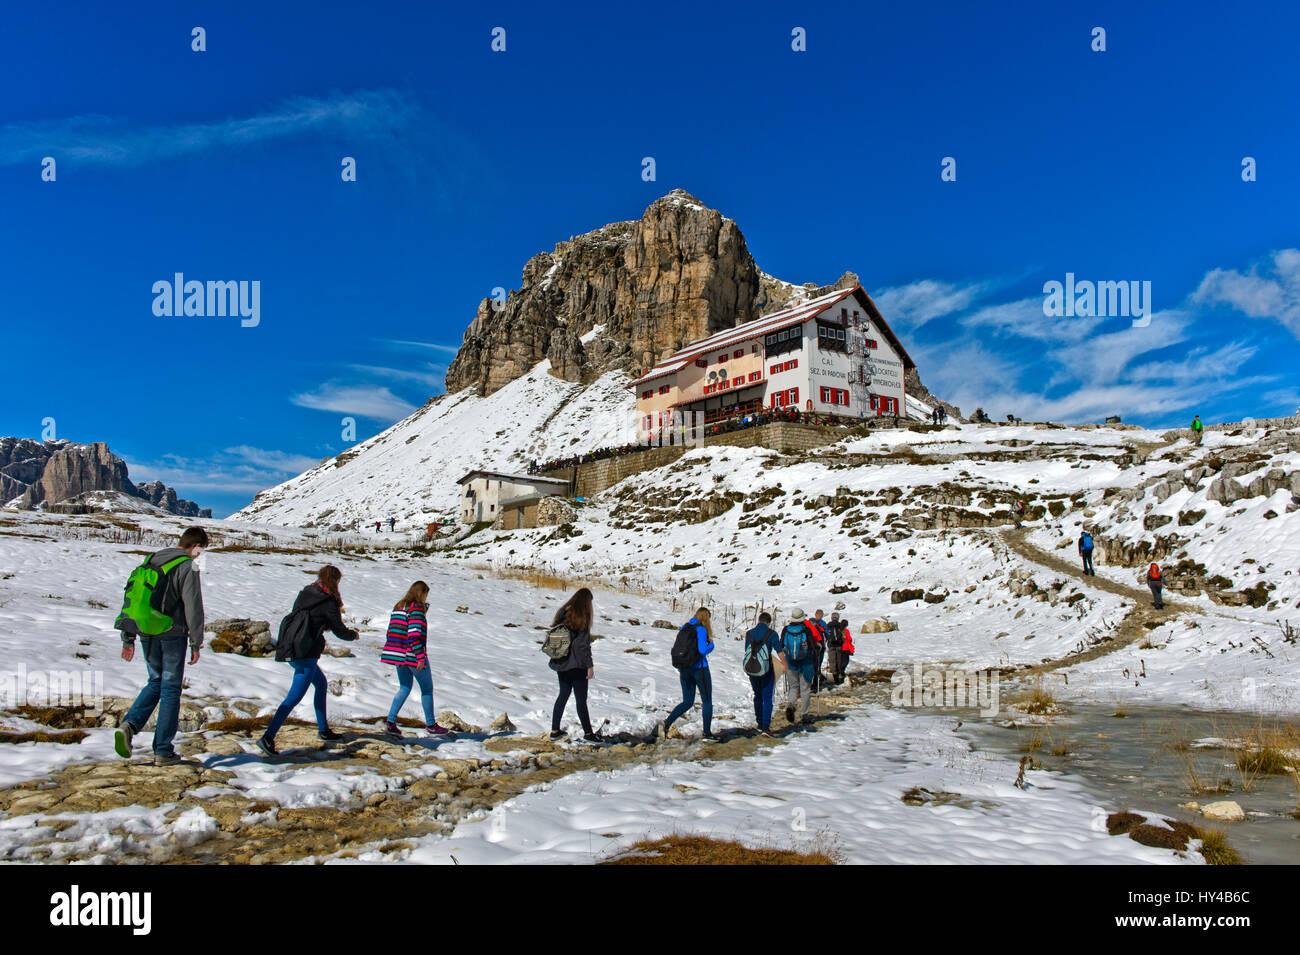 Hikers on the way to the Dreizinnenhütte, Rifugio Locatelli hut, Sesto Dolomites, South Tyrol, Trentino-Alto - Stock Image